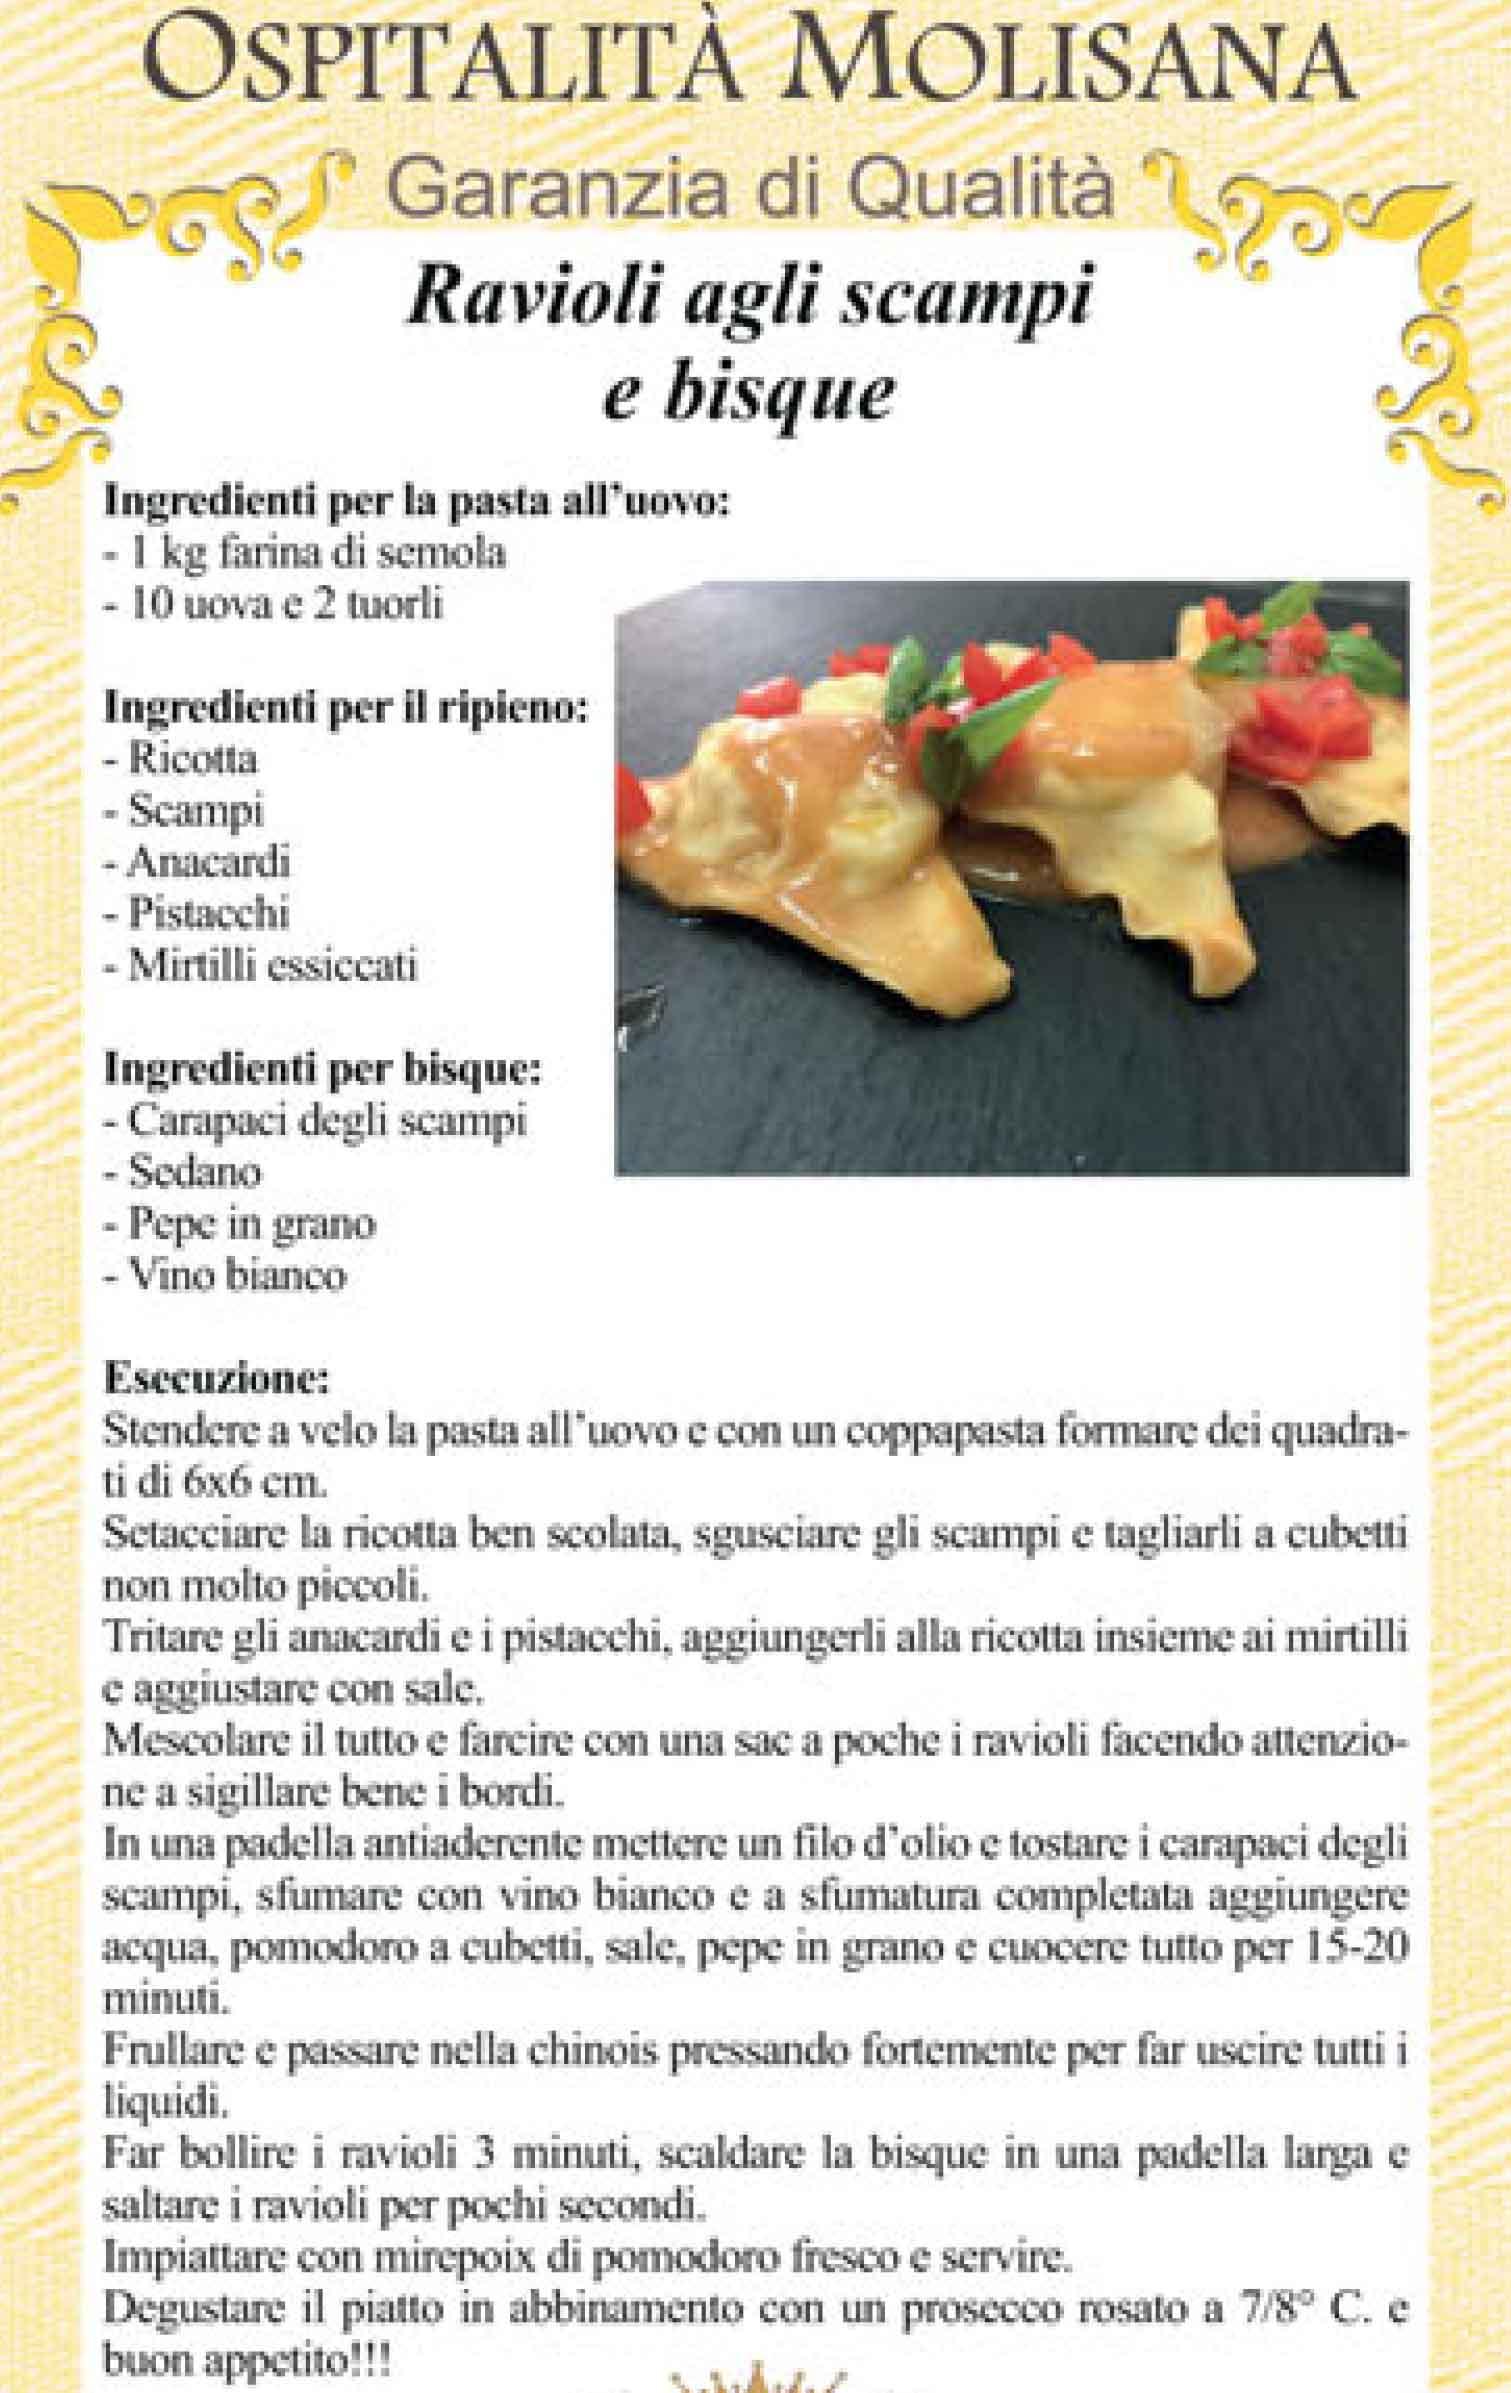 OSPITALITA' MOLISANA – Ravioli agli scampi e bisque